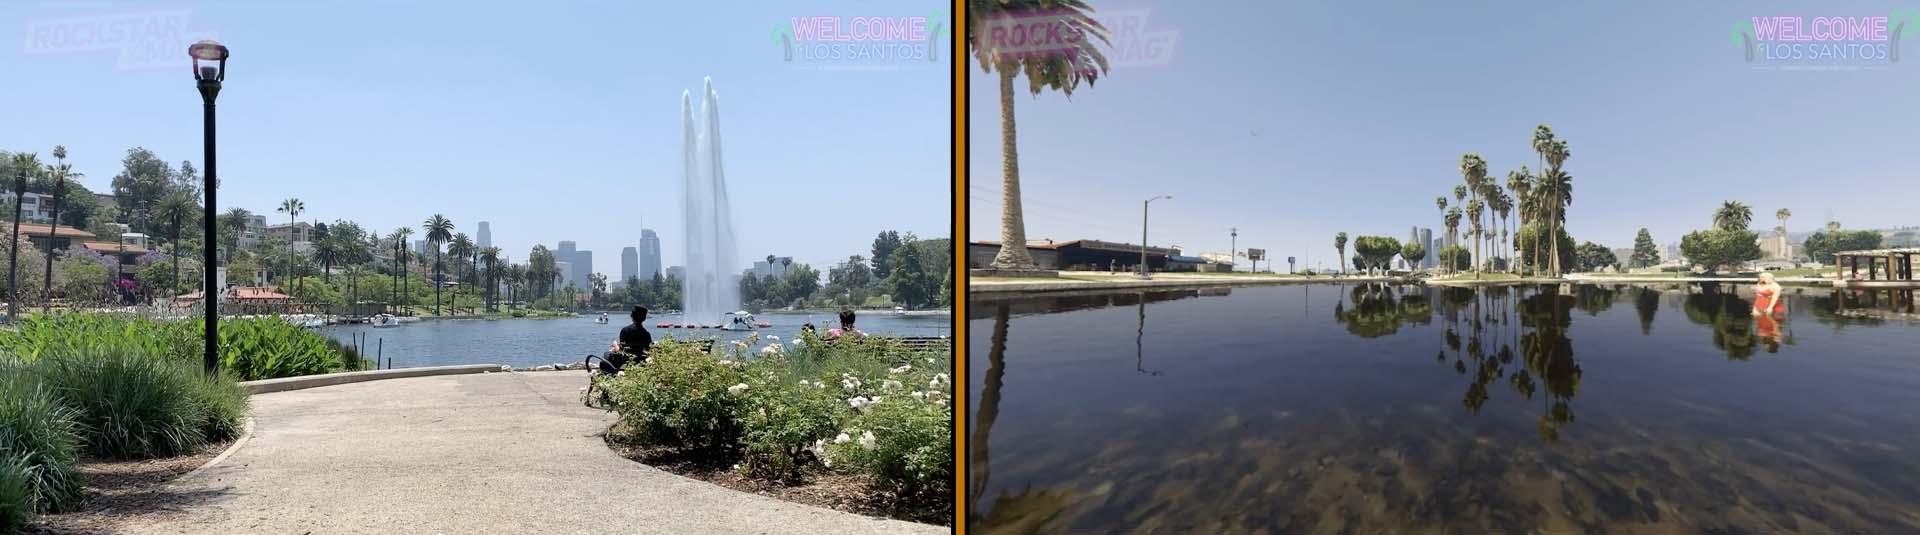 Vinewood 02 : Mirror Park